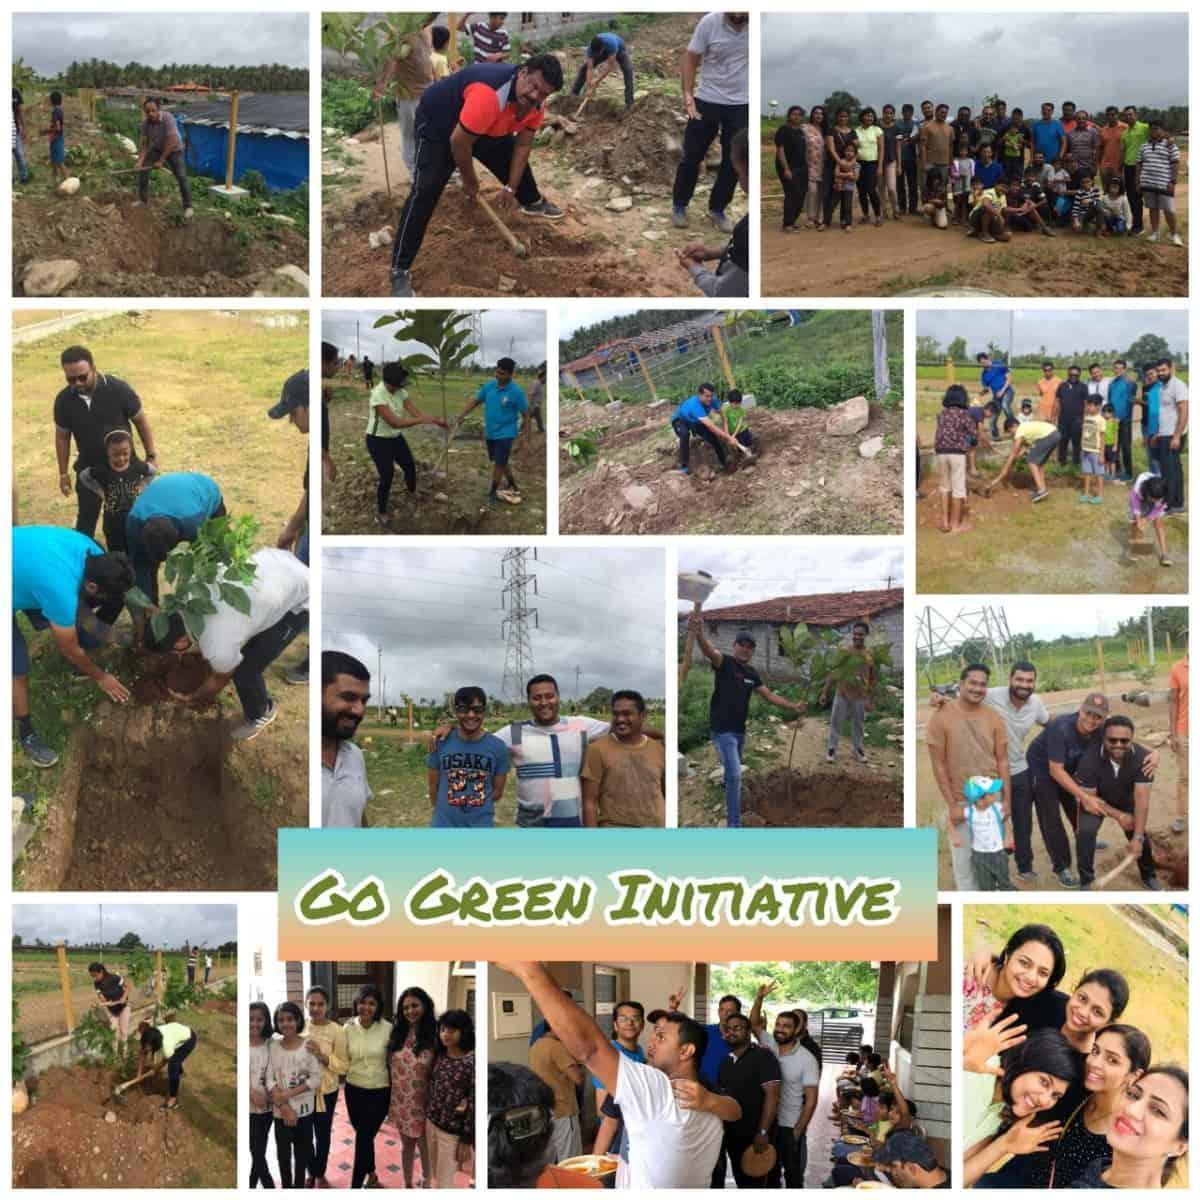 Go Green Project @ Gutti Colony